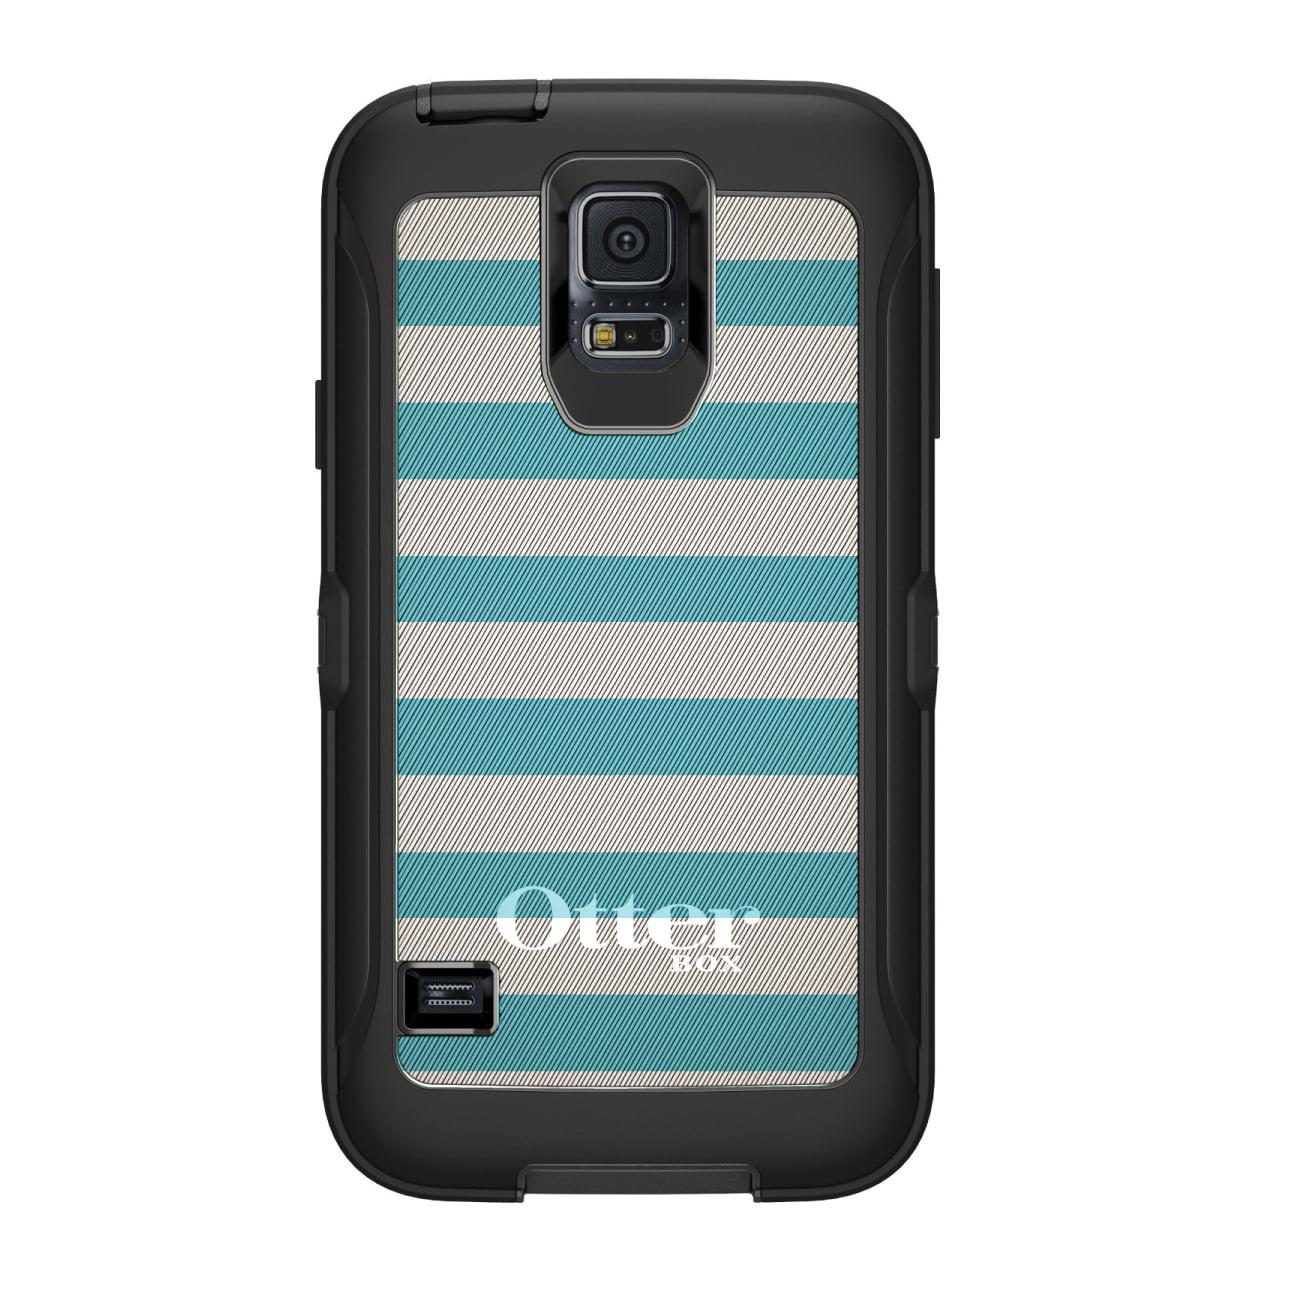 DistinctInk™ Custom Black OtterBox Defender Series Case for Samsung Galaxy S5 - Blue & White Bold Stripes